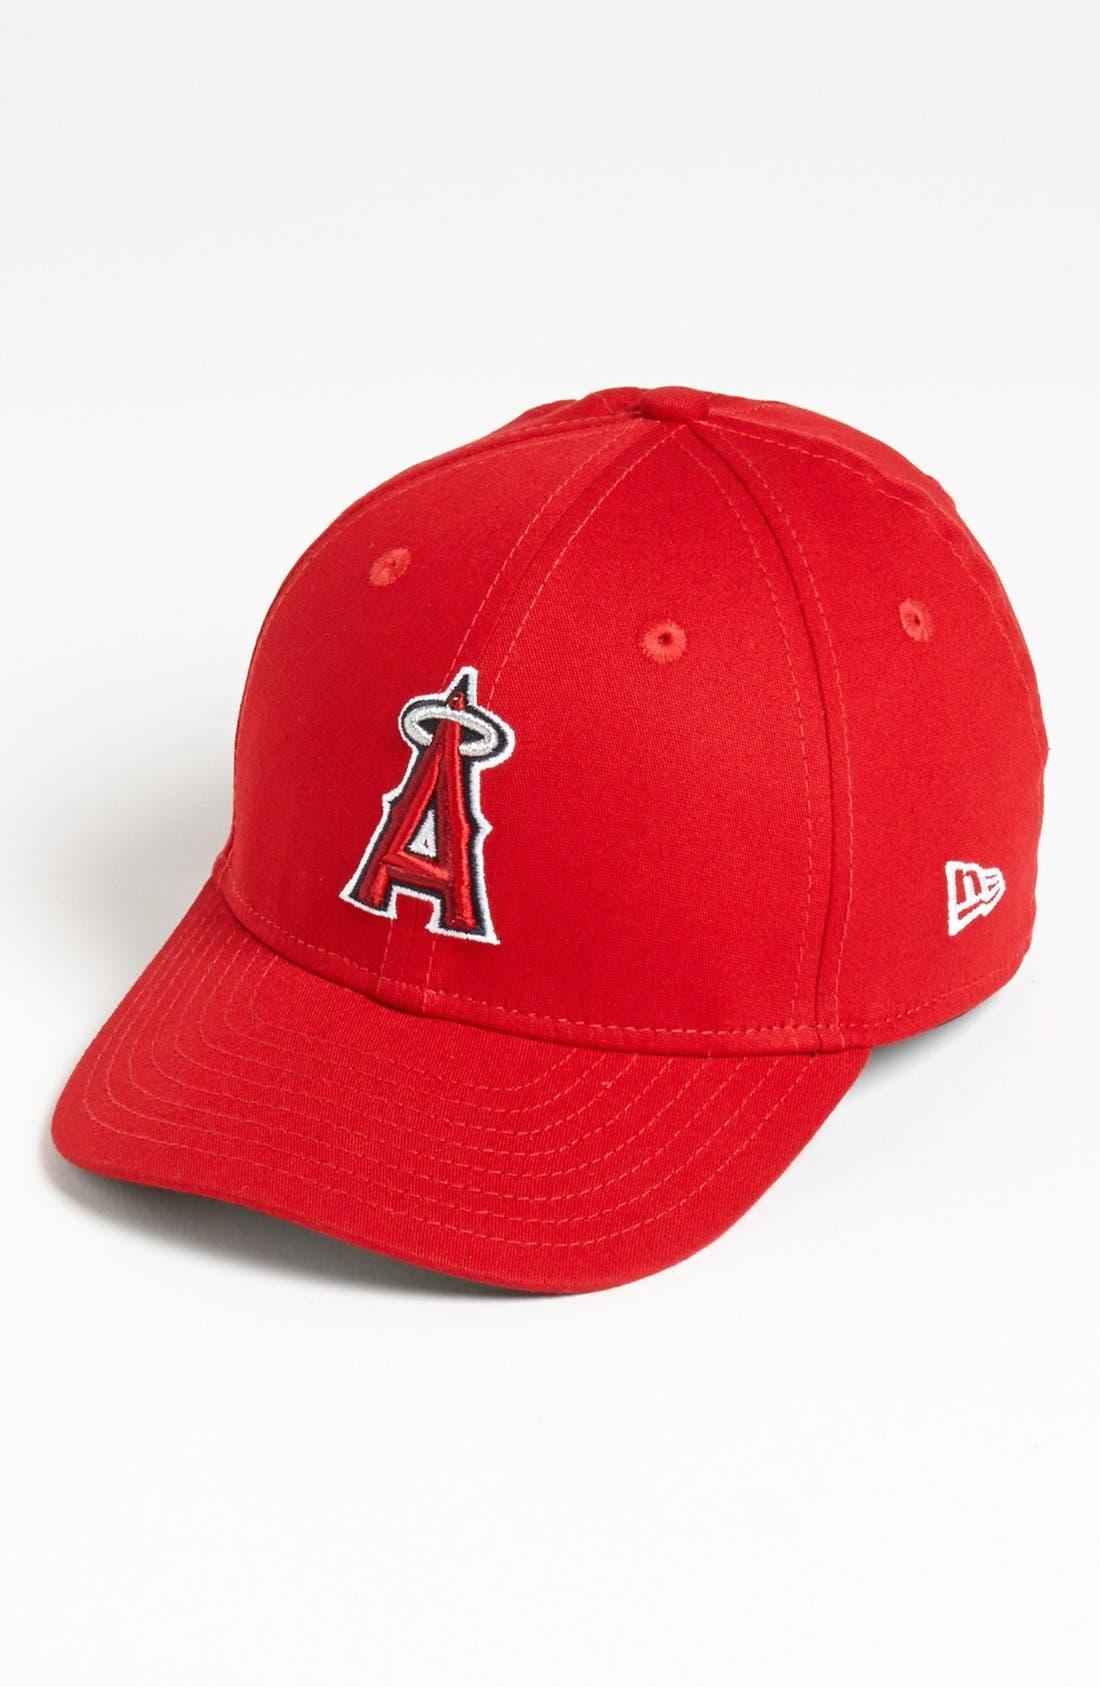 Main Image - New Era Cap 'Los Angeles Angels of Anaheim - Tie Breaker' Baseball Cap (Big Boys)